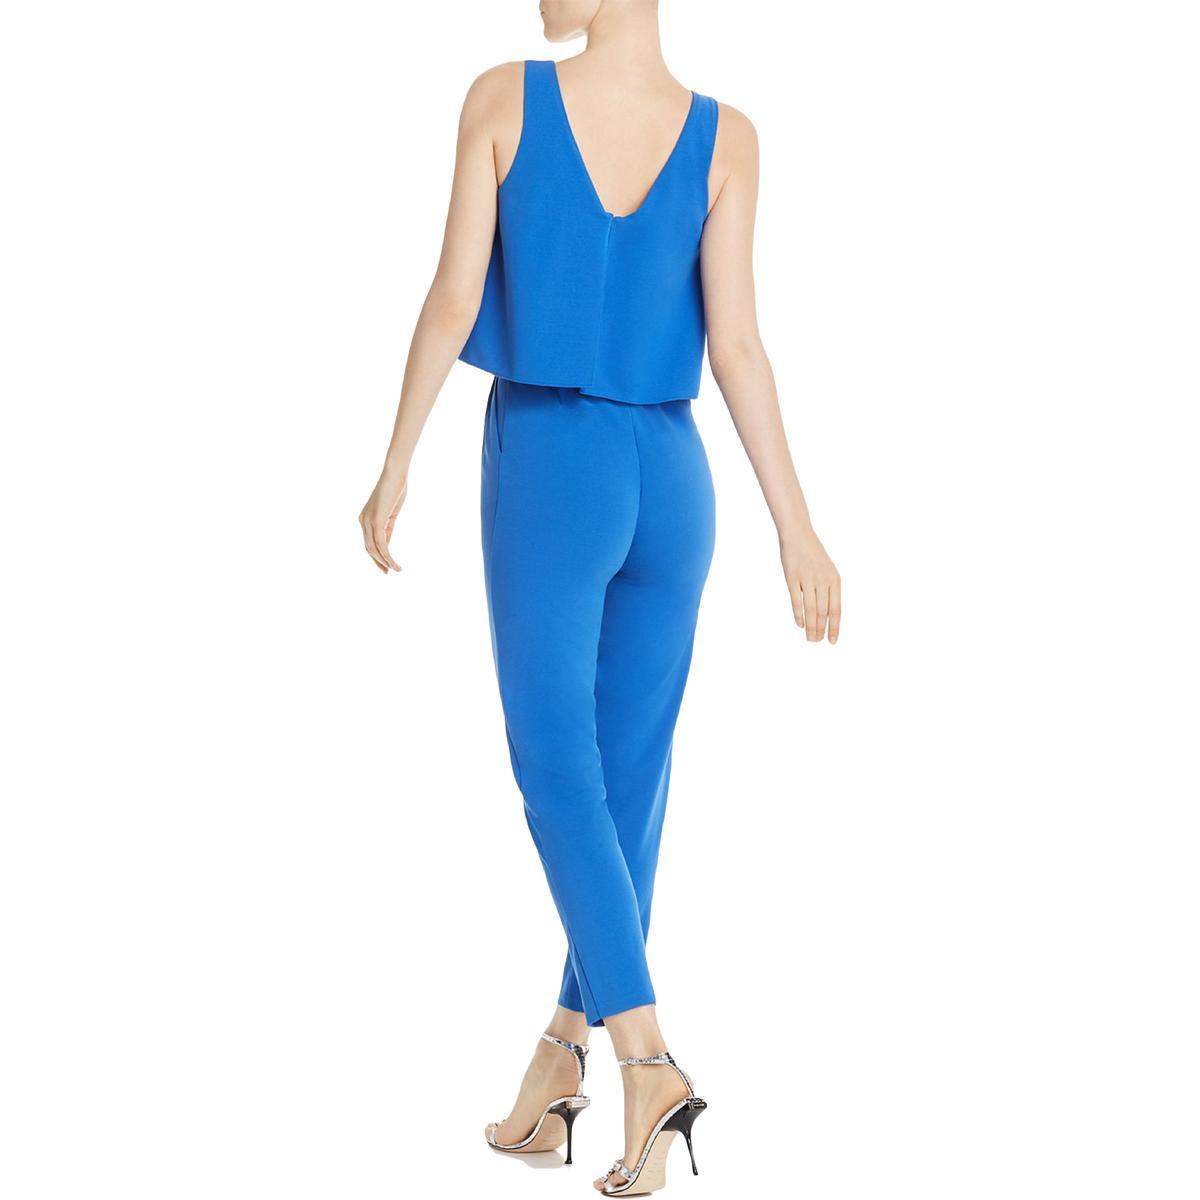 miniatuur 6 - Aqua Womens Cora Popover Straight Leg Dressy Jumpsuit BHFO 7046